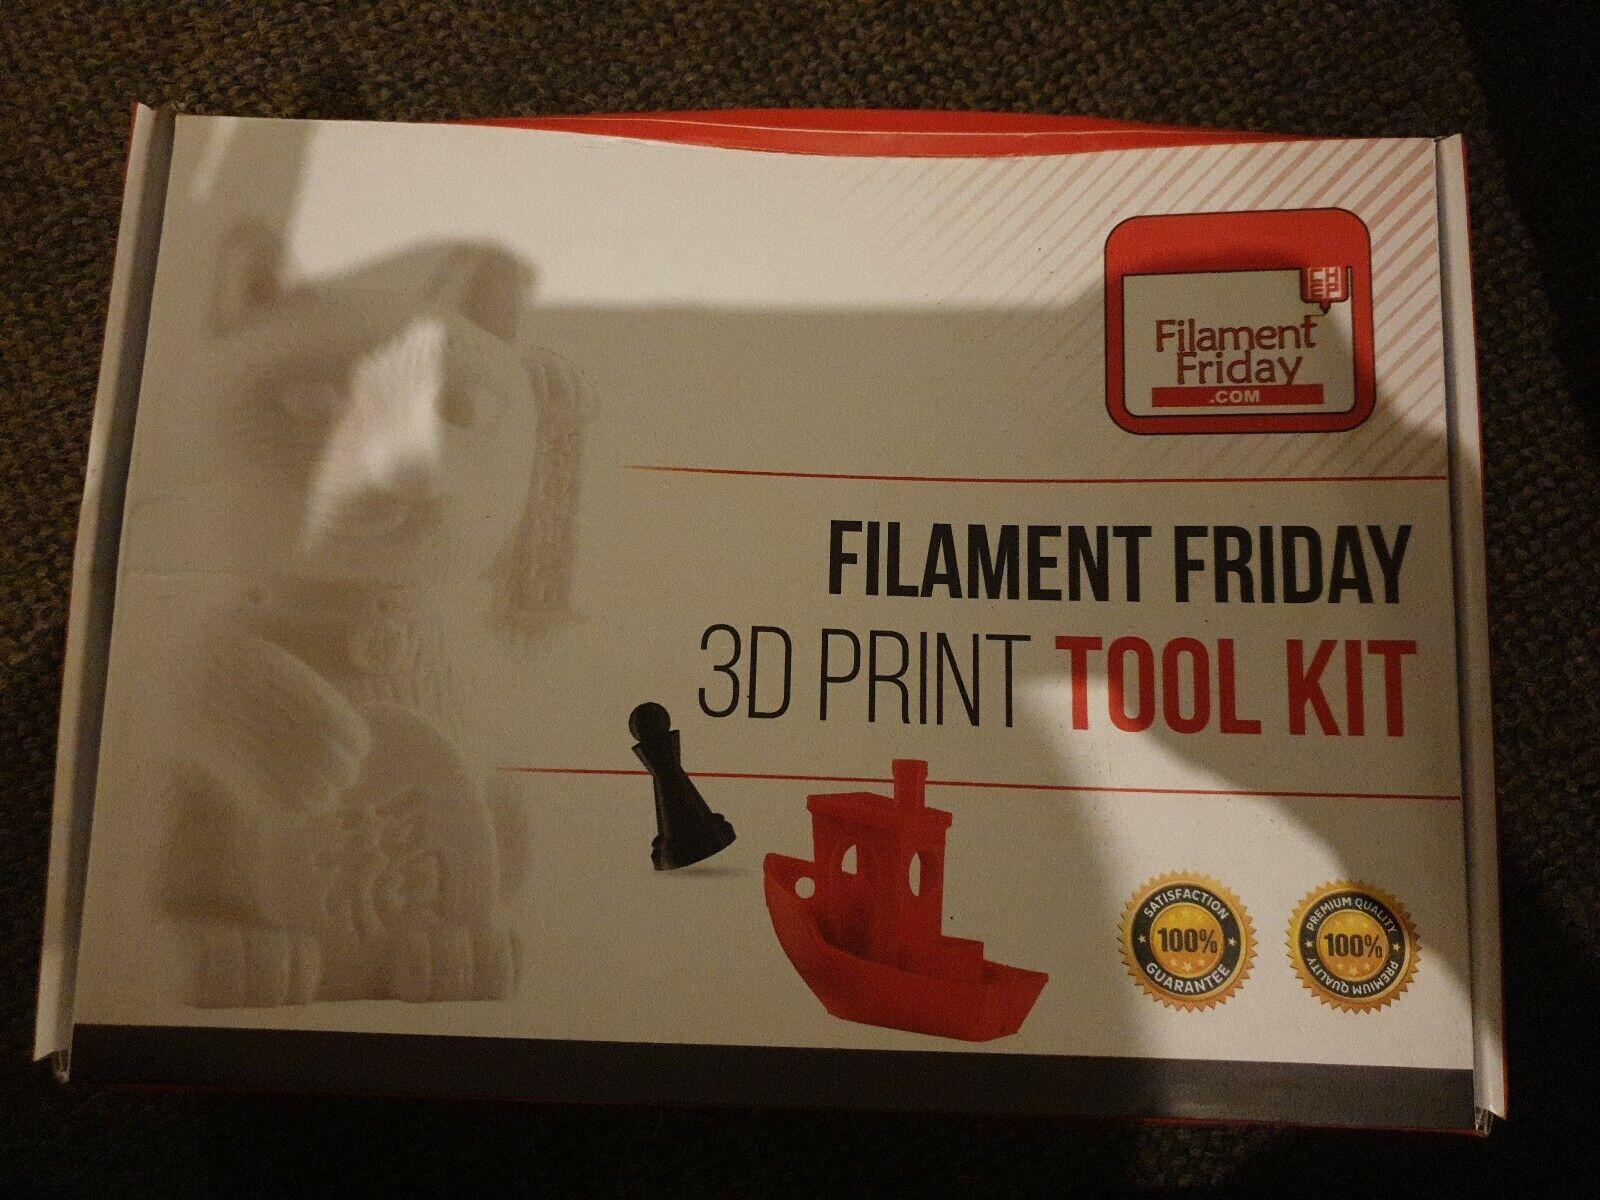 Filament Friday 3d Print Tool Kits